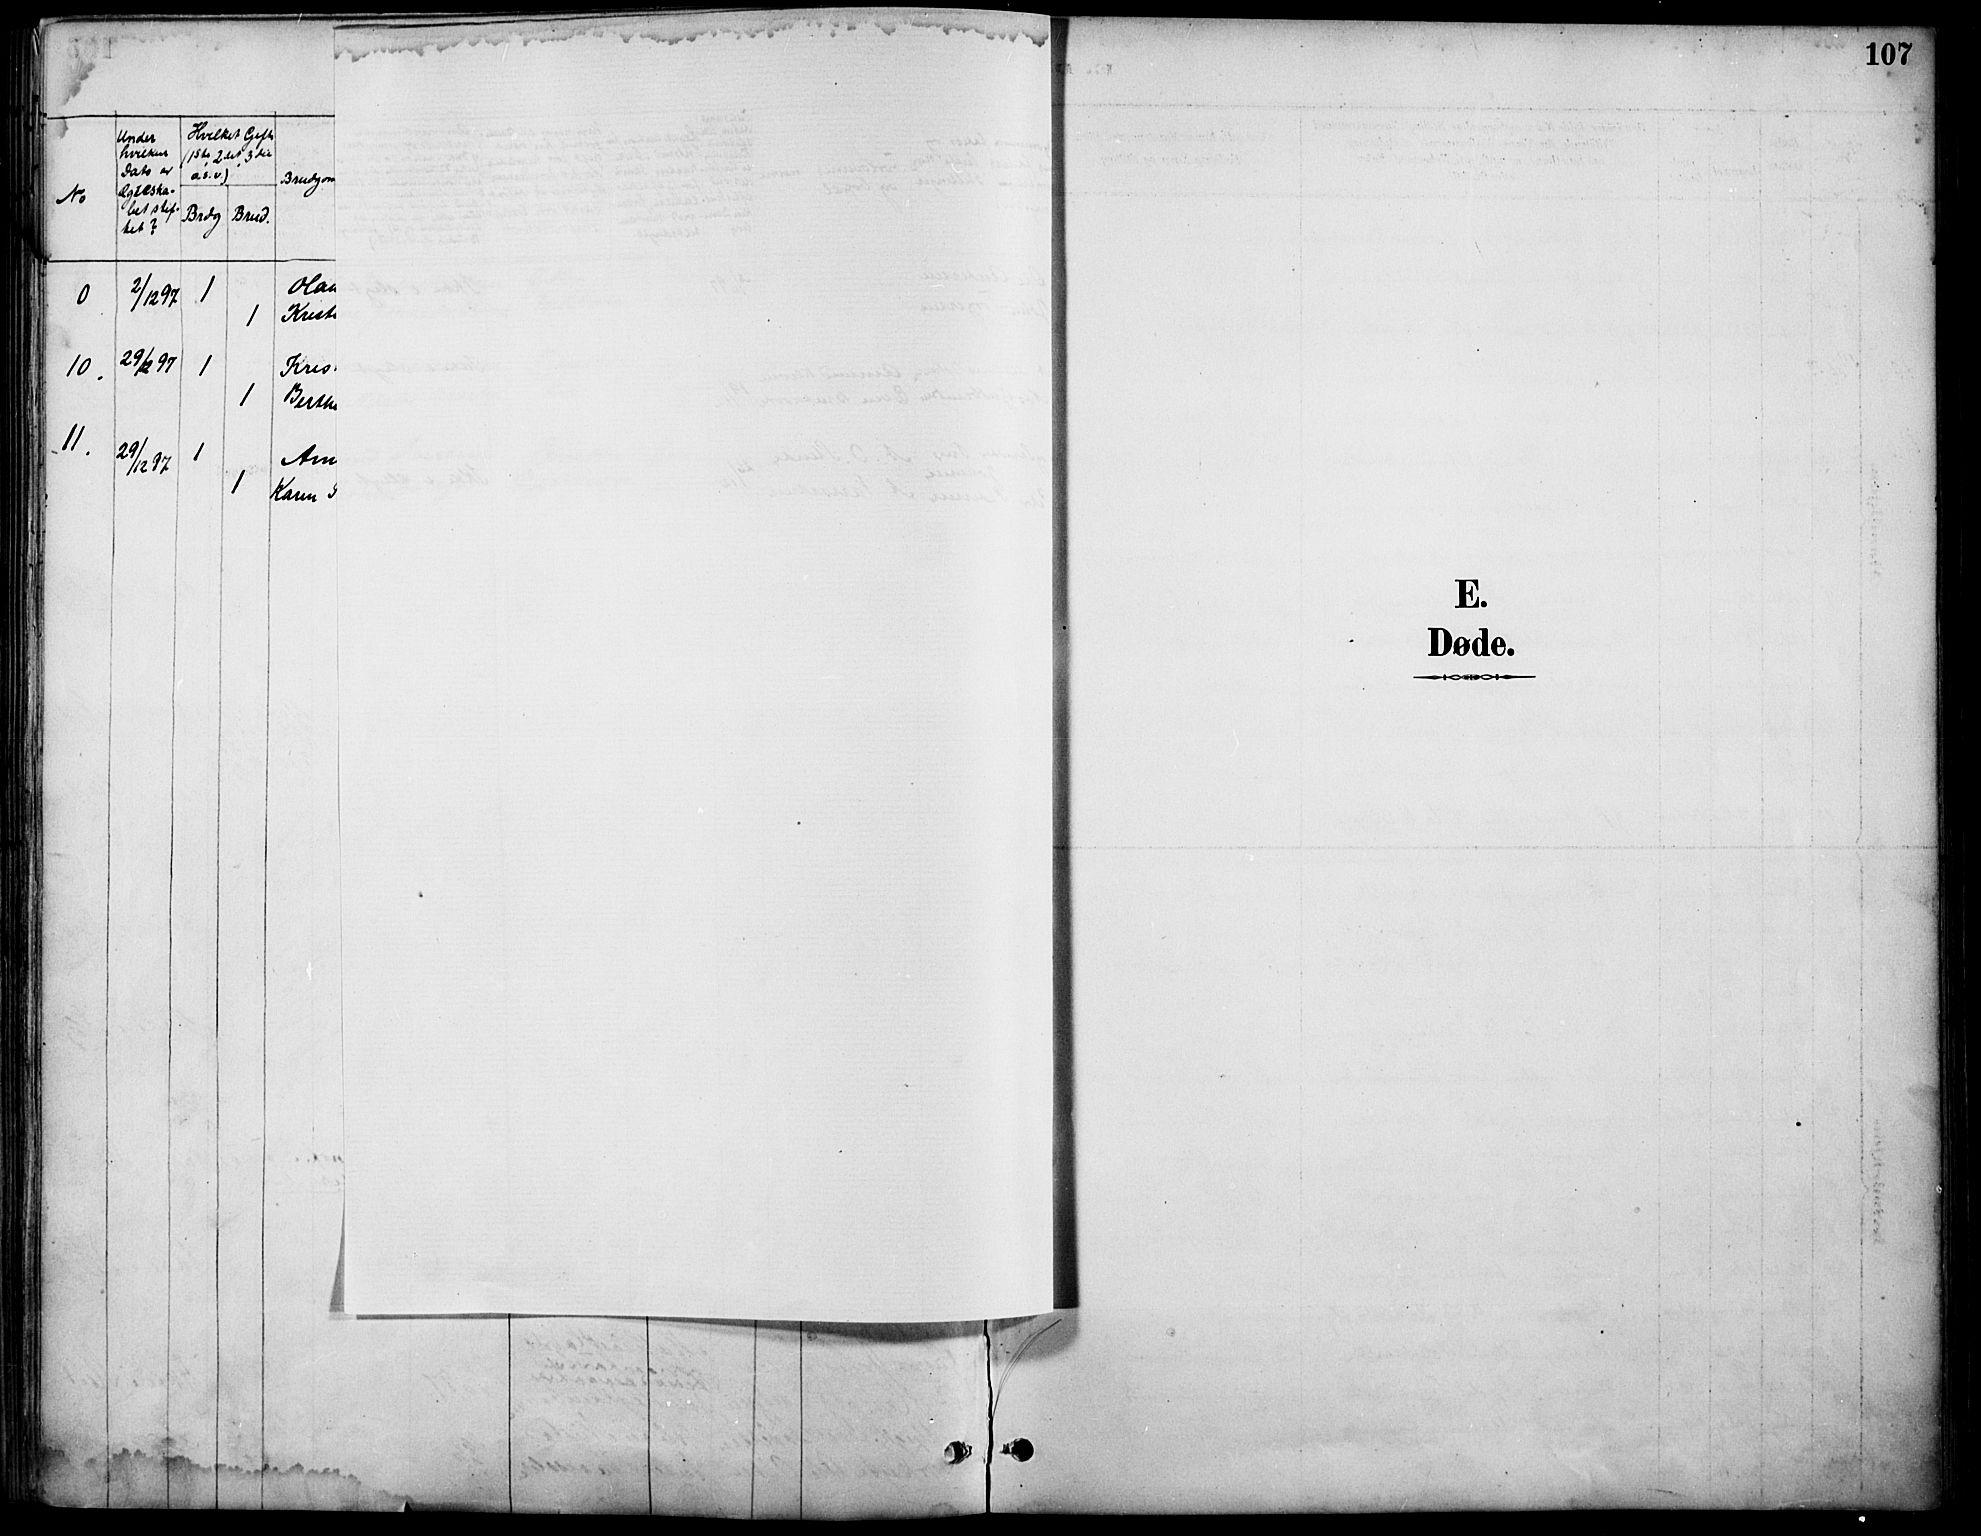 SAH, Østre Gausdal prestekontor, Ministerialbok nr. 2, 1887-1897, s. 107